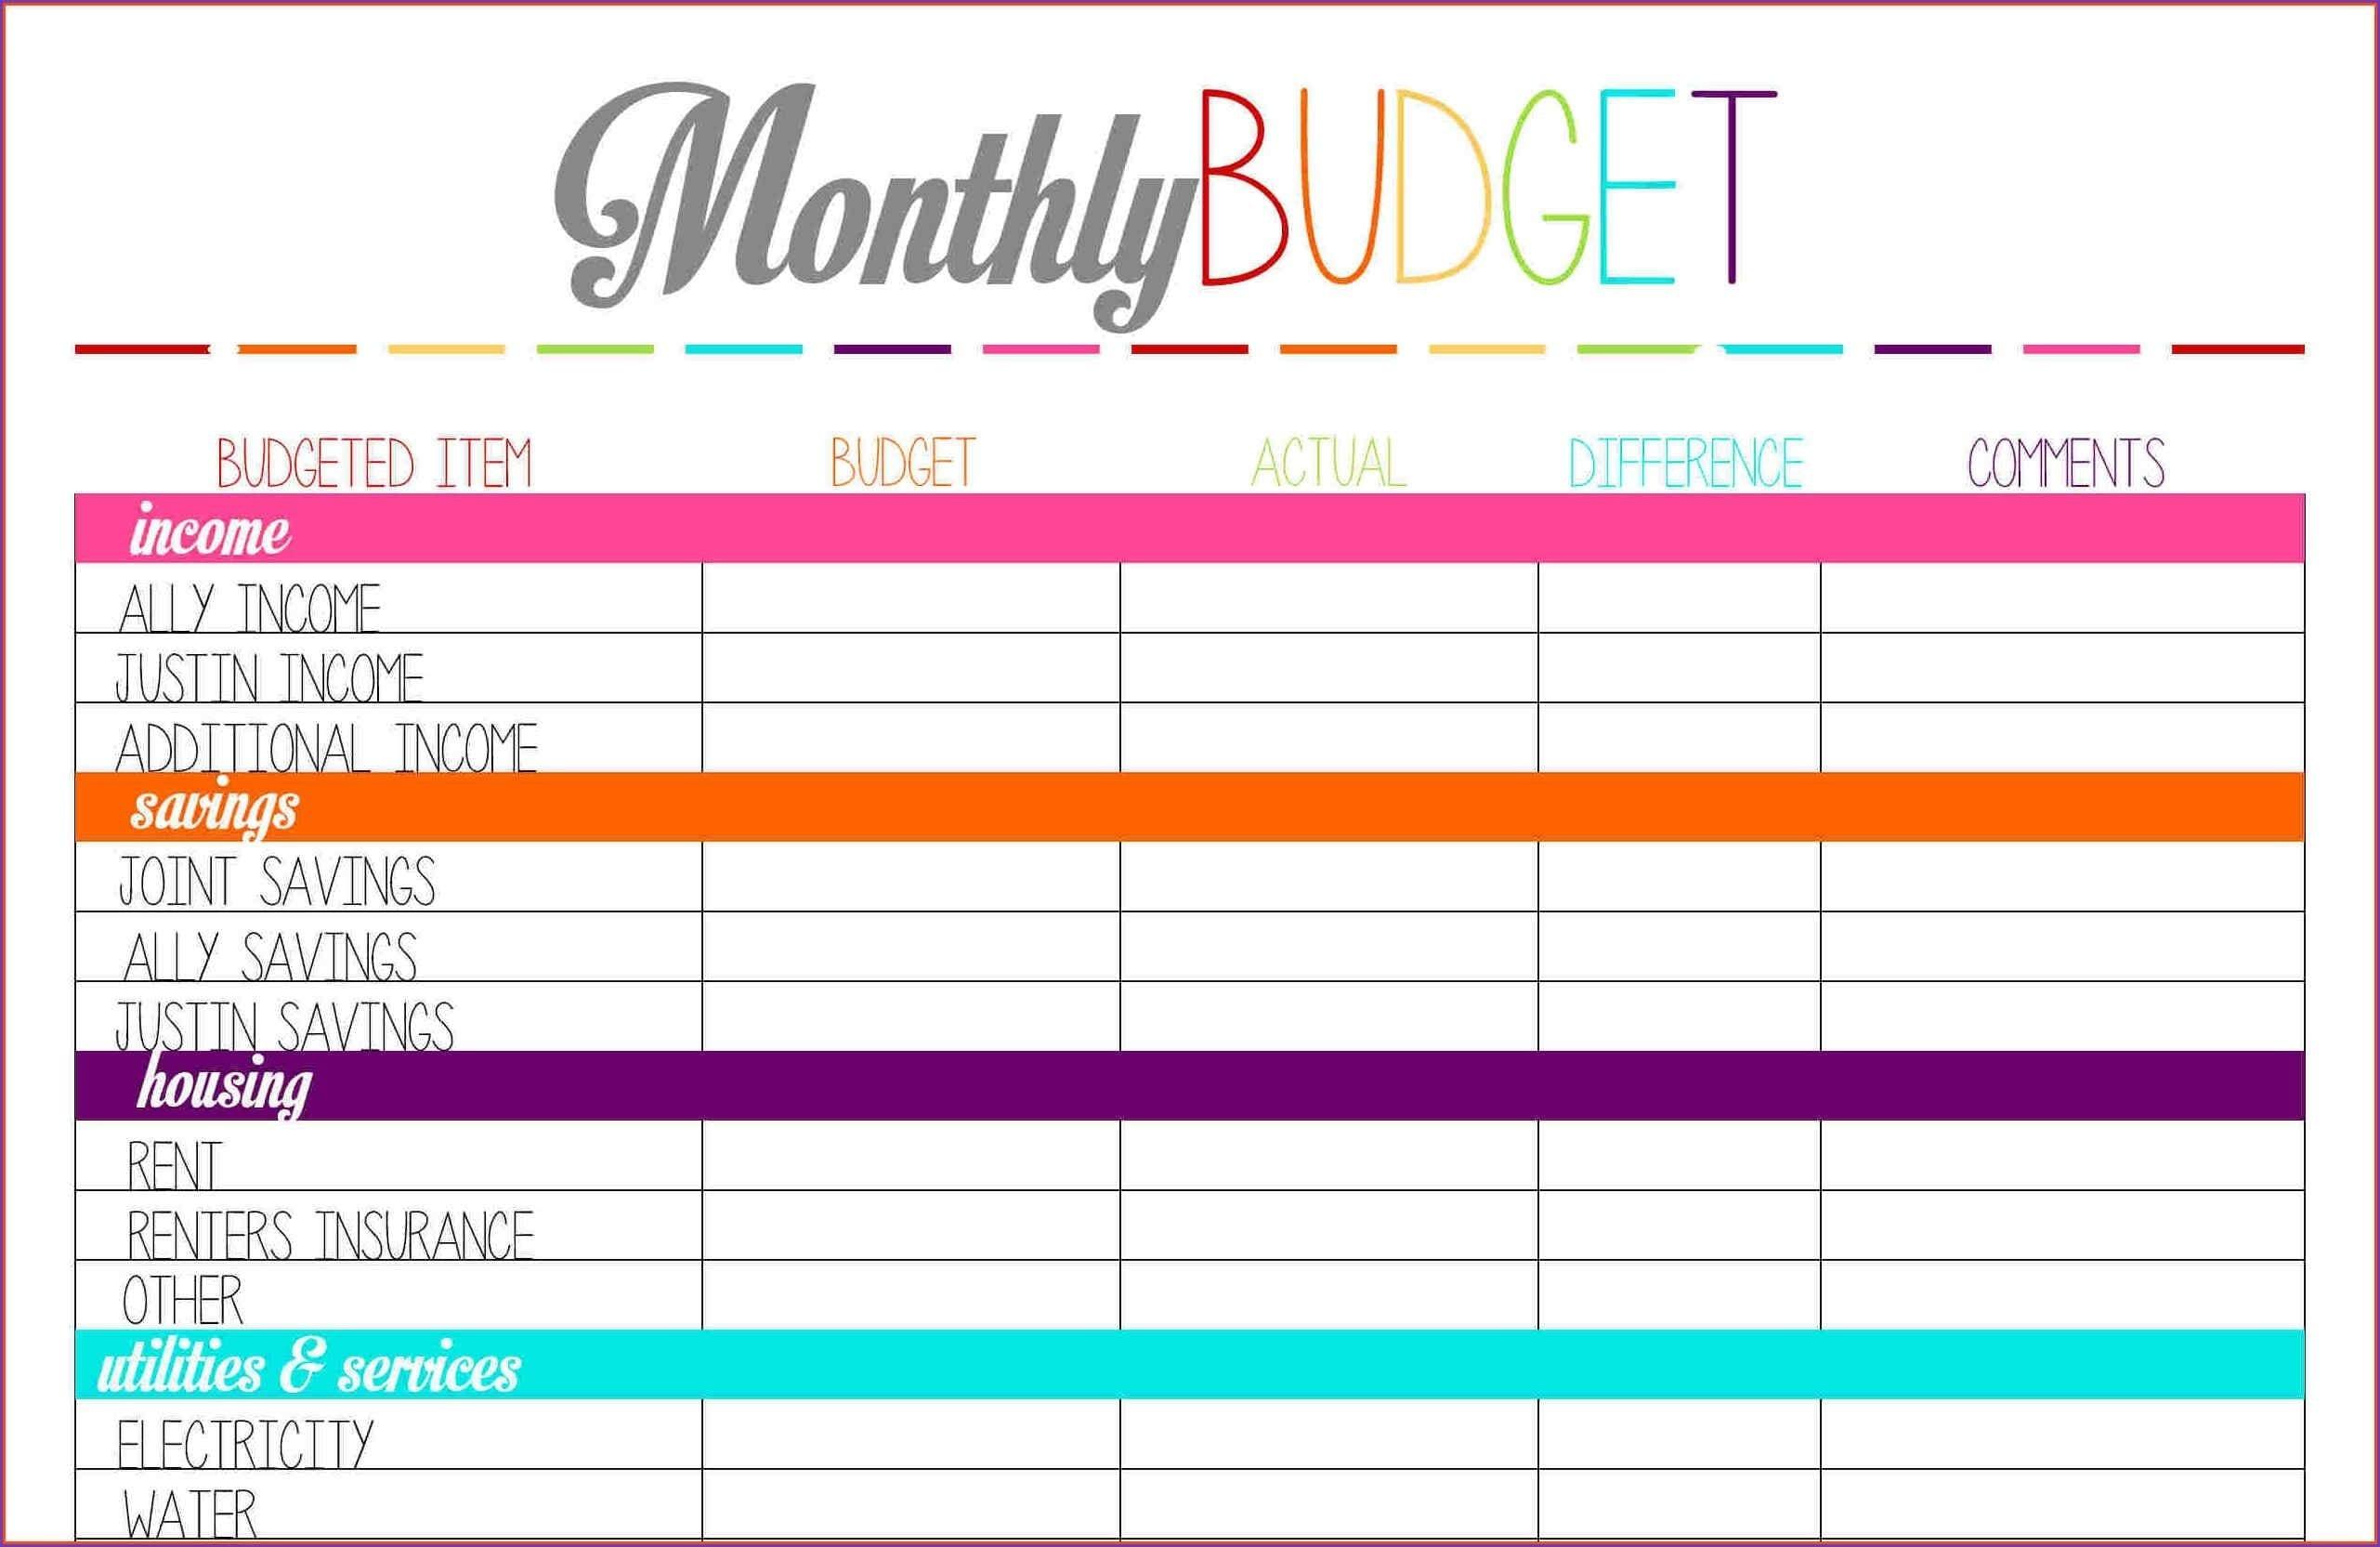 012 Printable Budget Worksheet Template Plan Unforgettable Templates With Free Printable Budget Worksheet Template